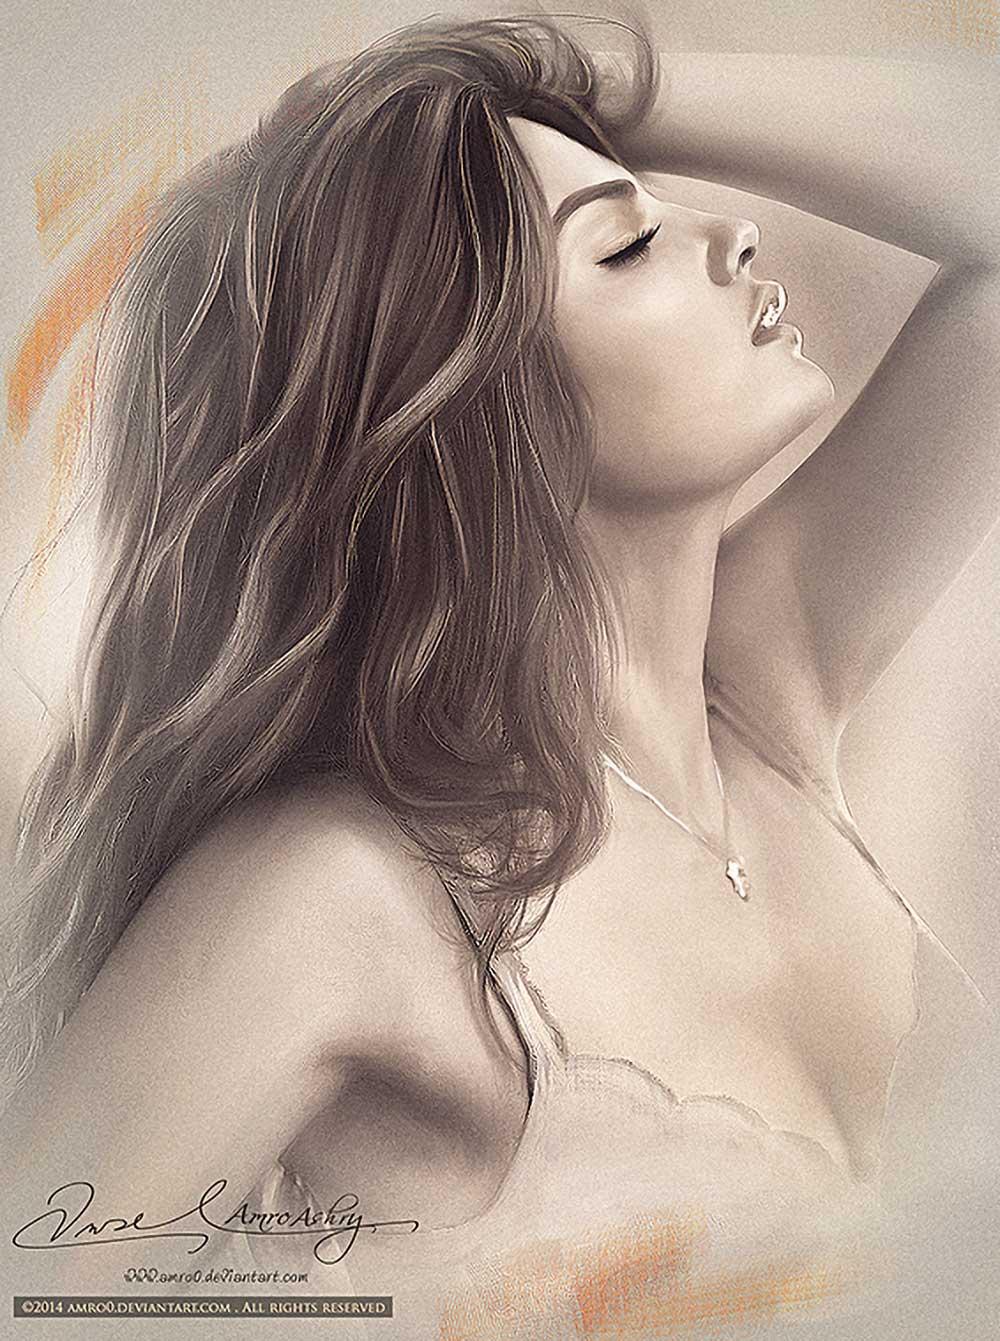 Inspirational Art : The Beauty of a Woman 4 by Amro Ashry [Amro0]